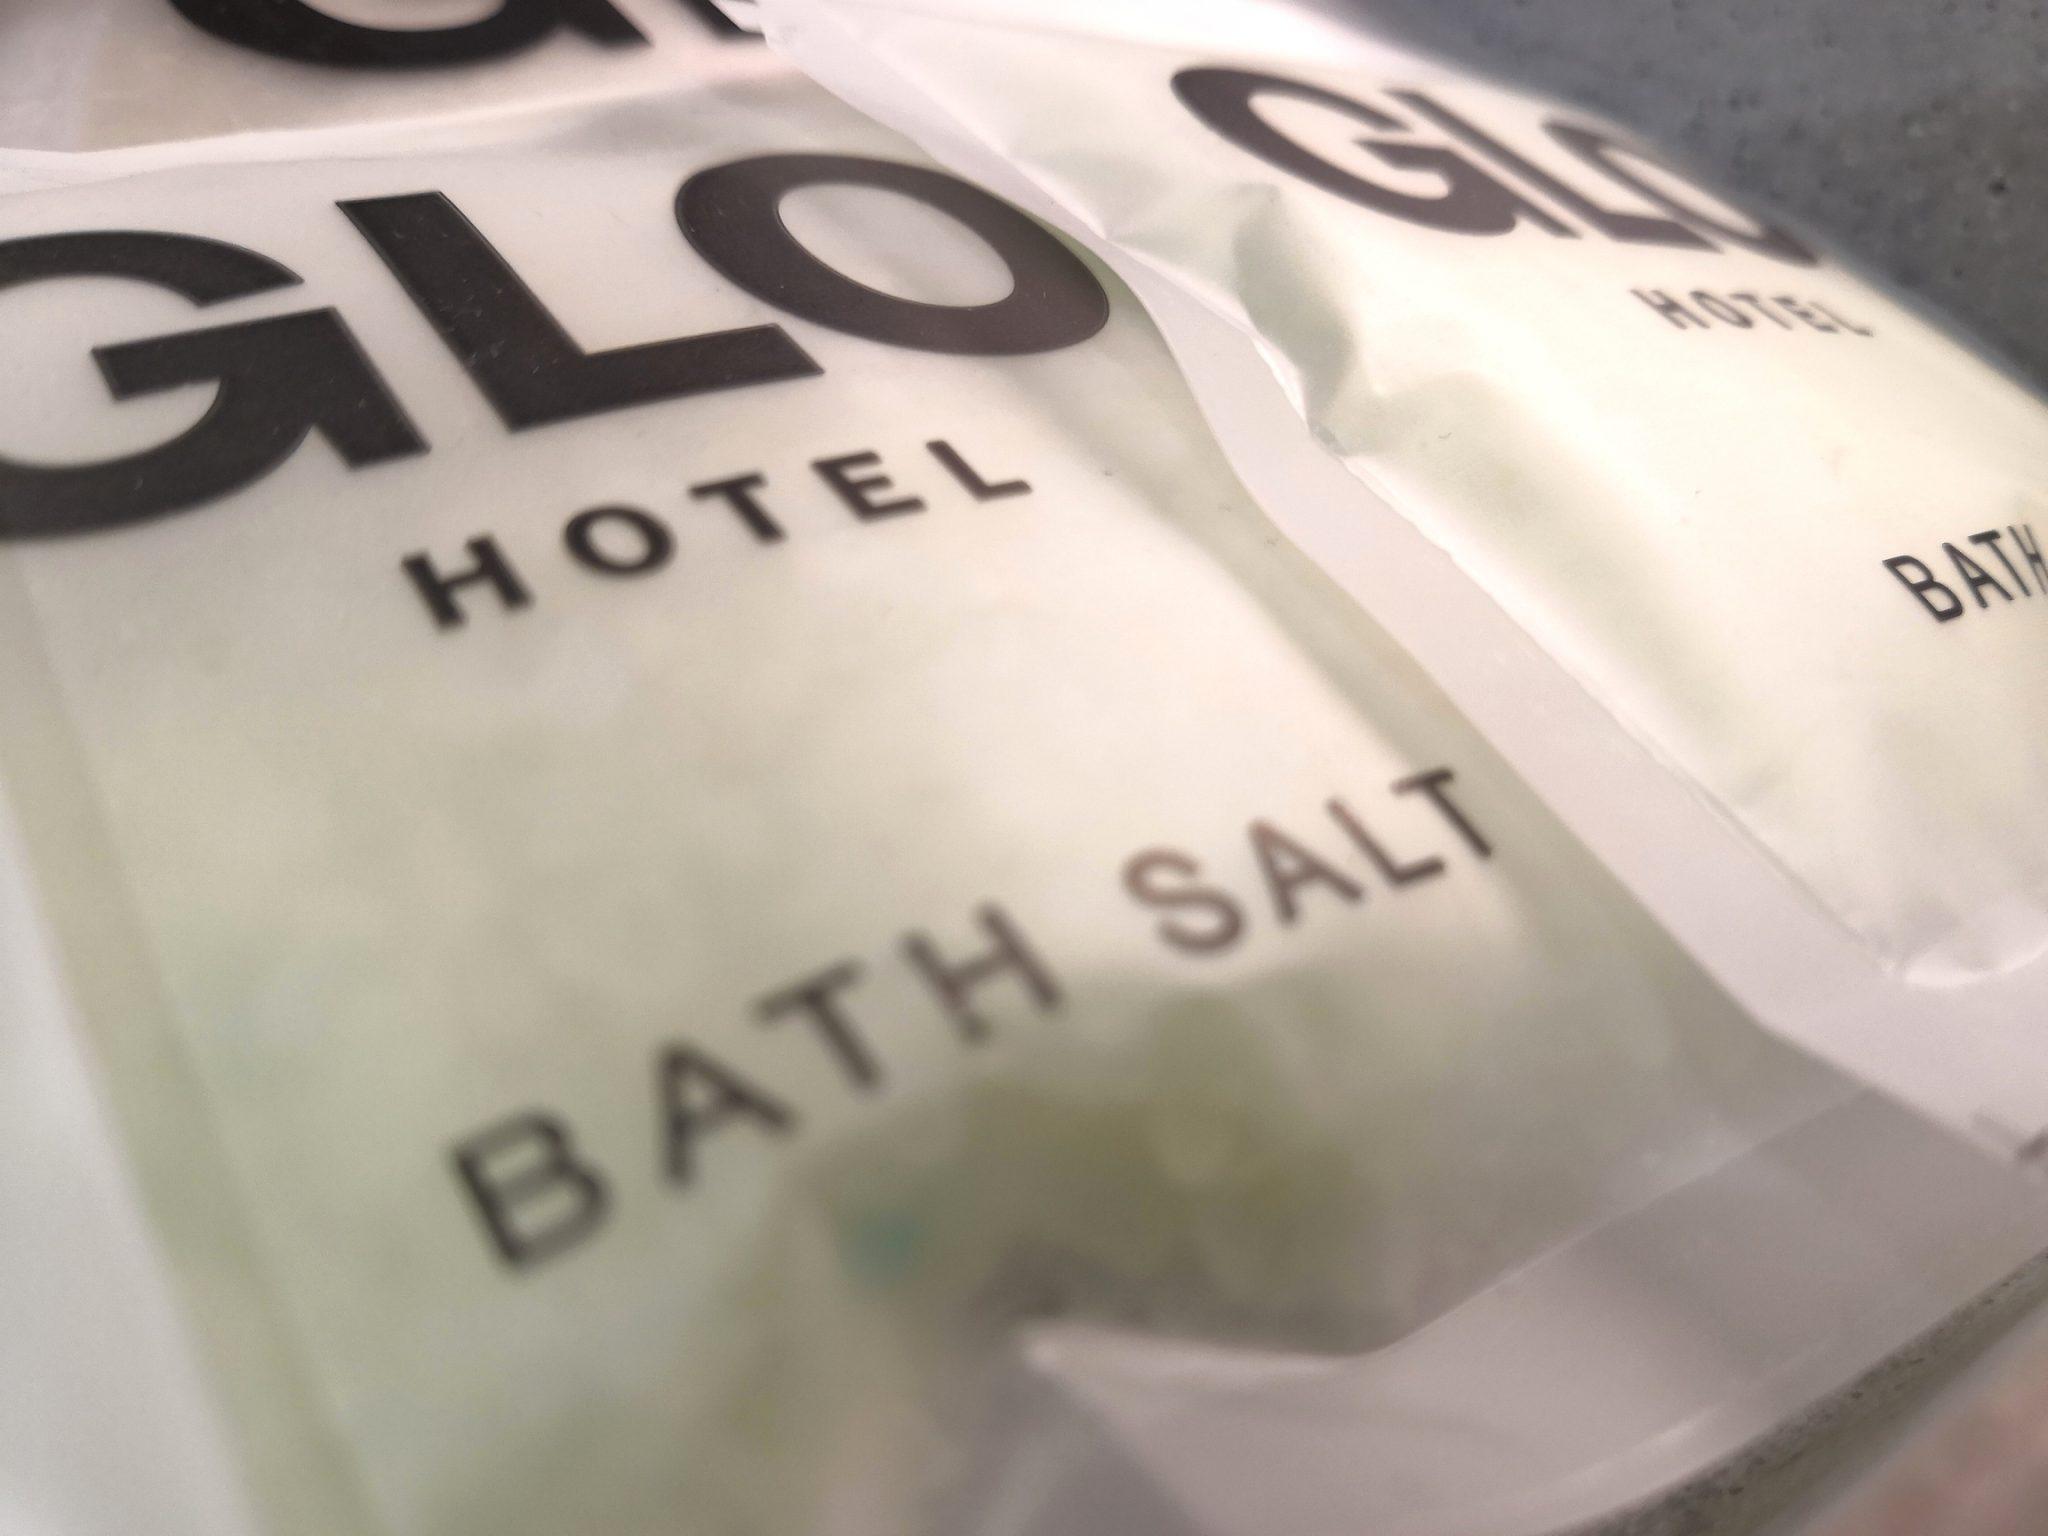 kylpy hotelli